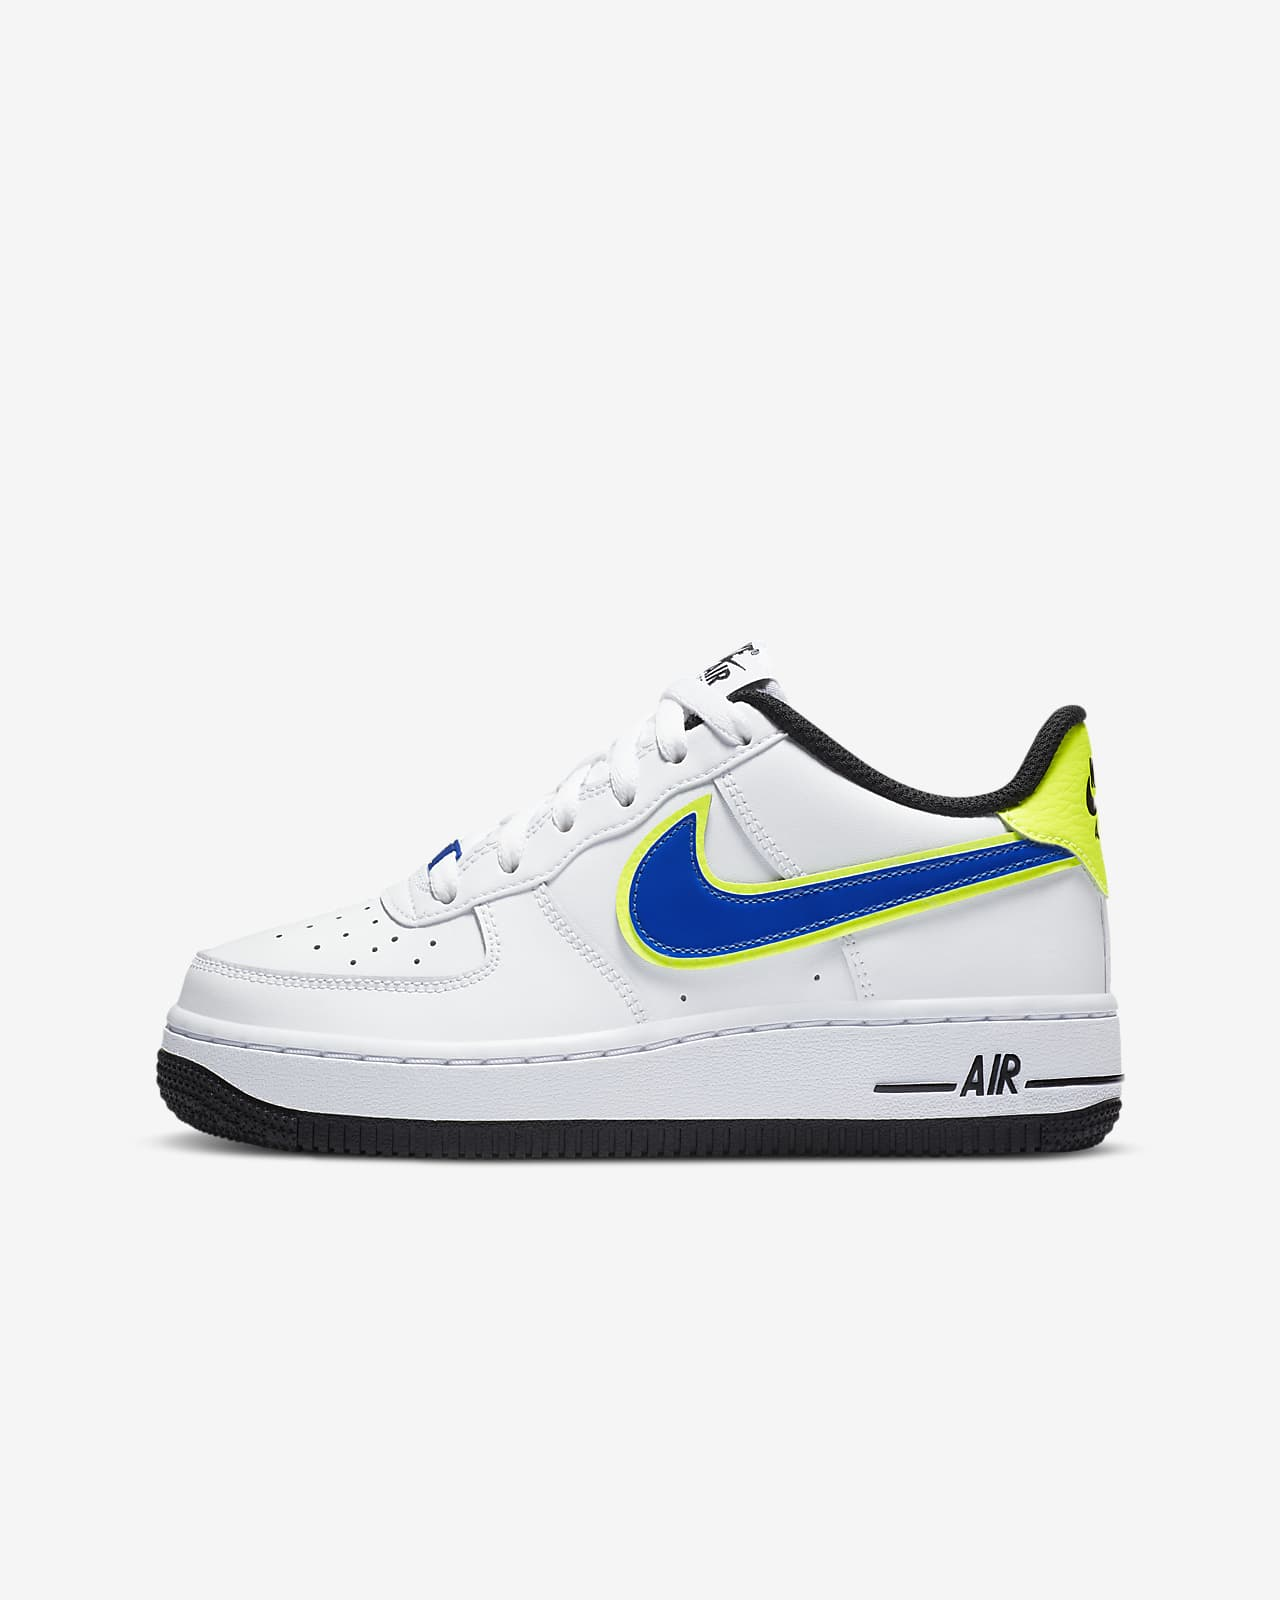 Nike Air Force 1 '07 Schuh für ältere Kinder